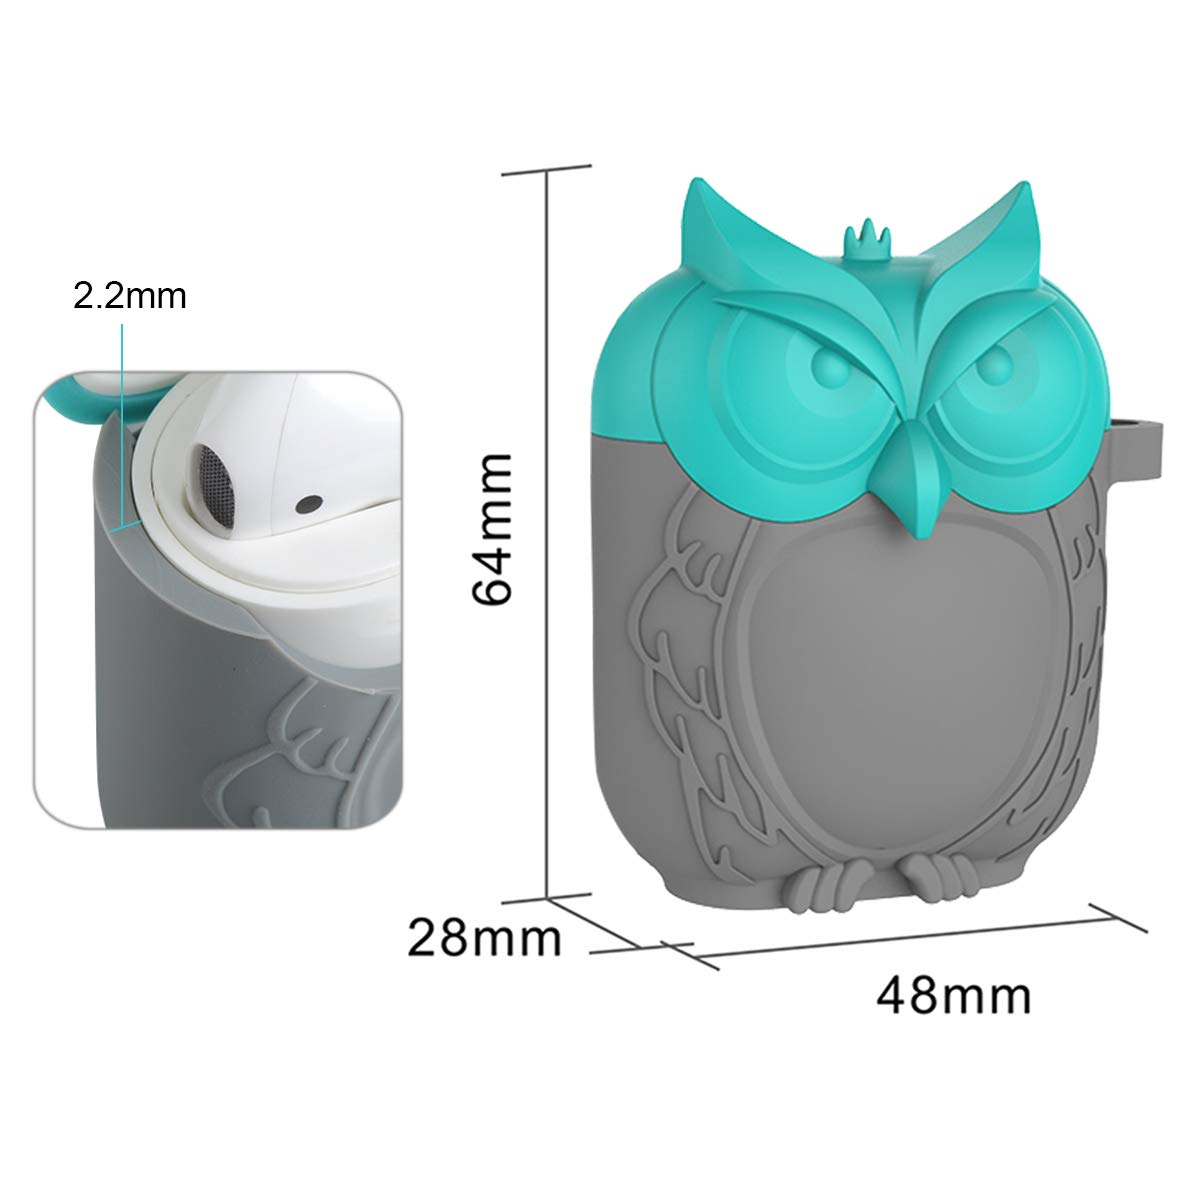 MAS CARNEY Fundas Airpods Silicona Protectora Owl Airpods Case Compatible con Apple Airpods 1 y 2 Originales LED Frontal no Visible